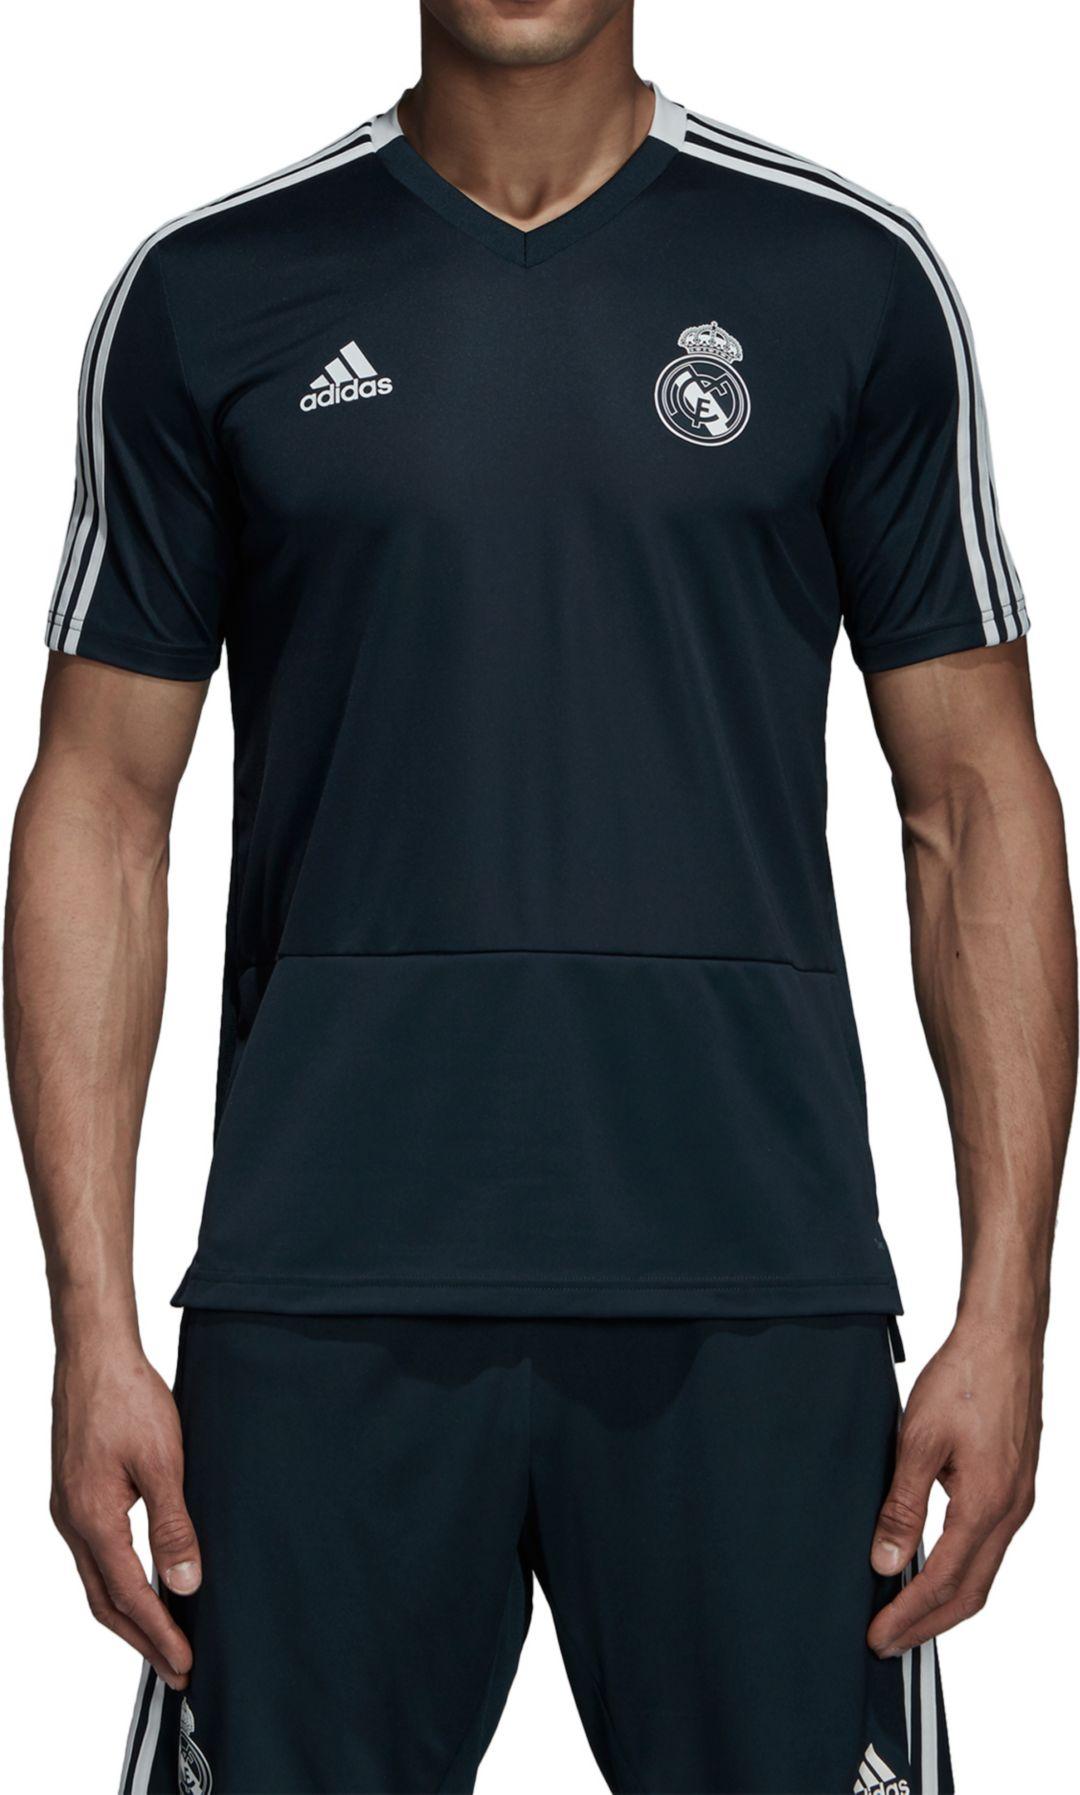 promo code 18fd8 ee1c8 adidas Men's Real Madrid Training Black Performance Shirt